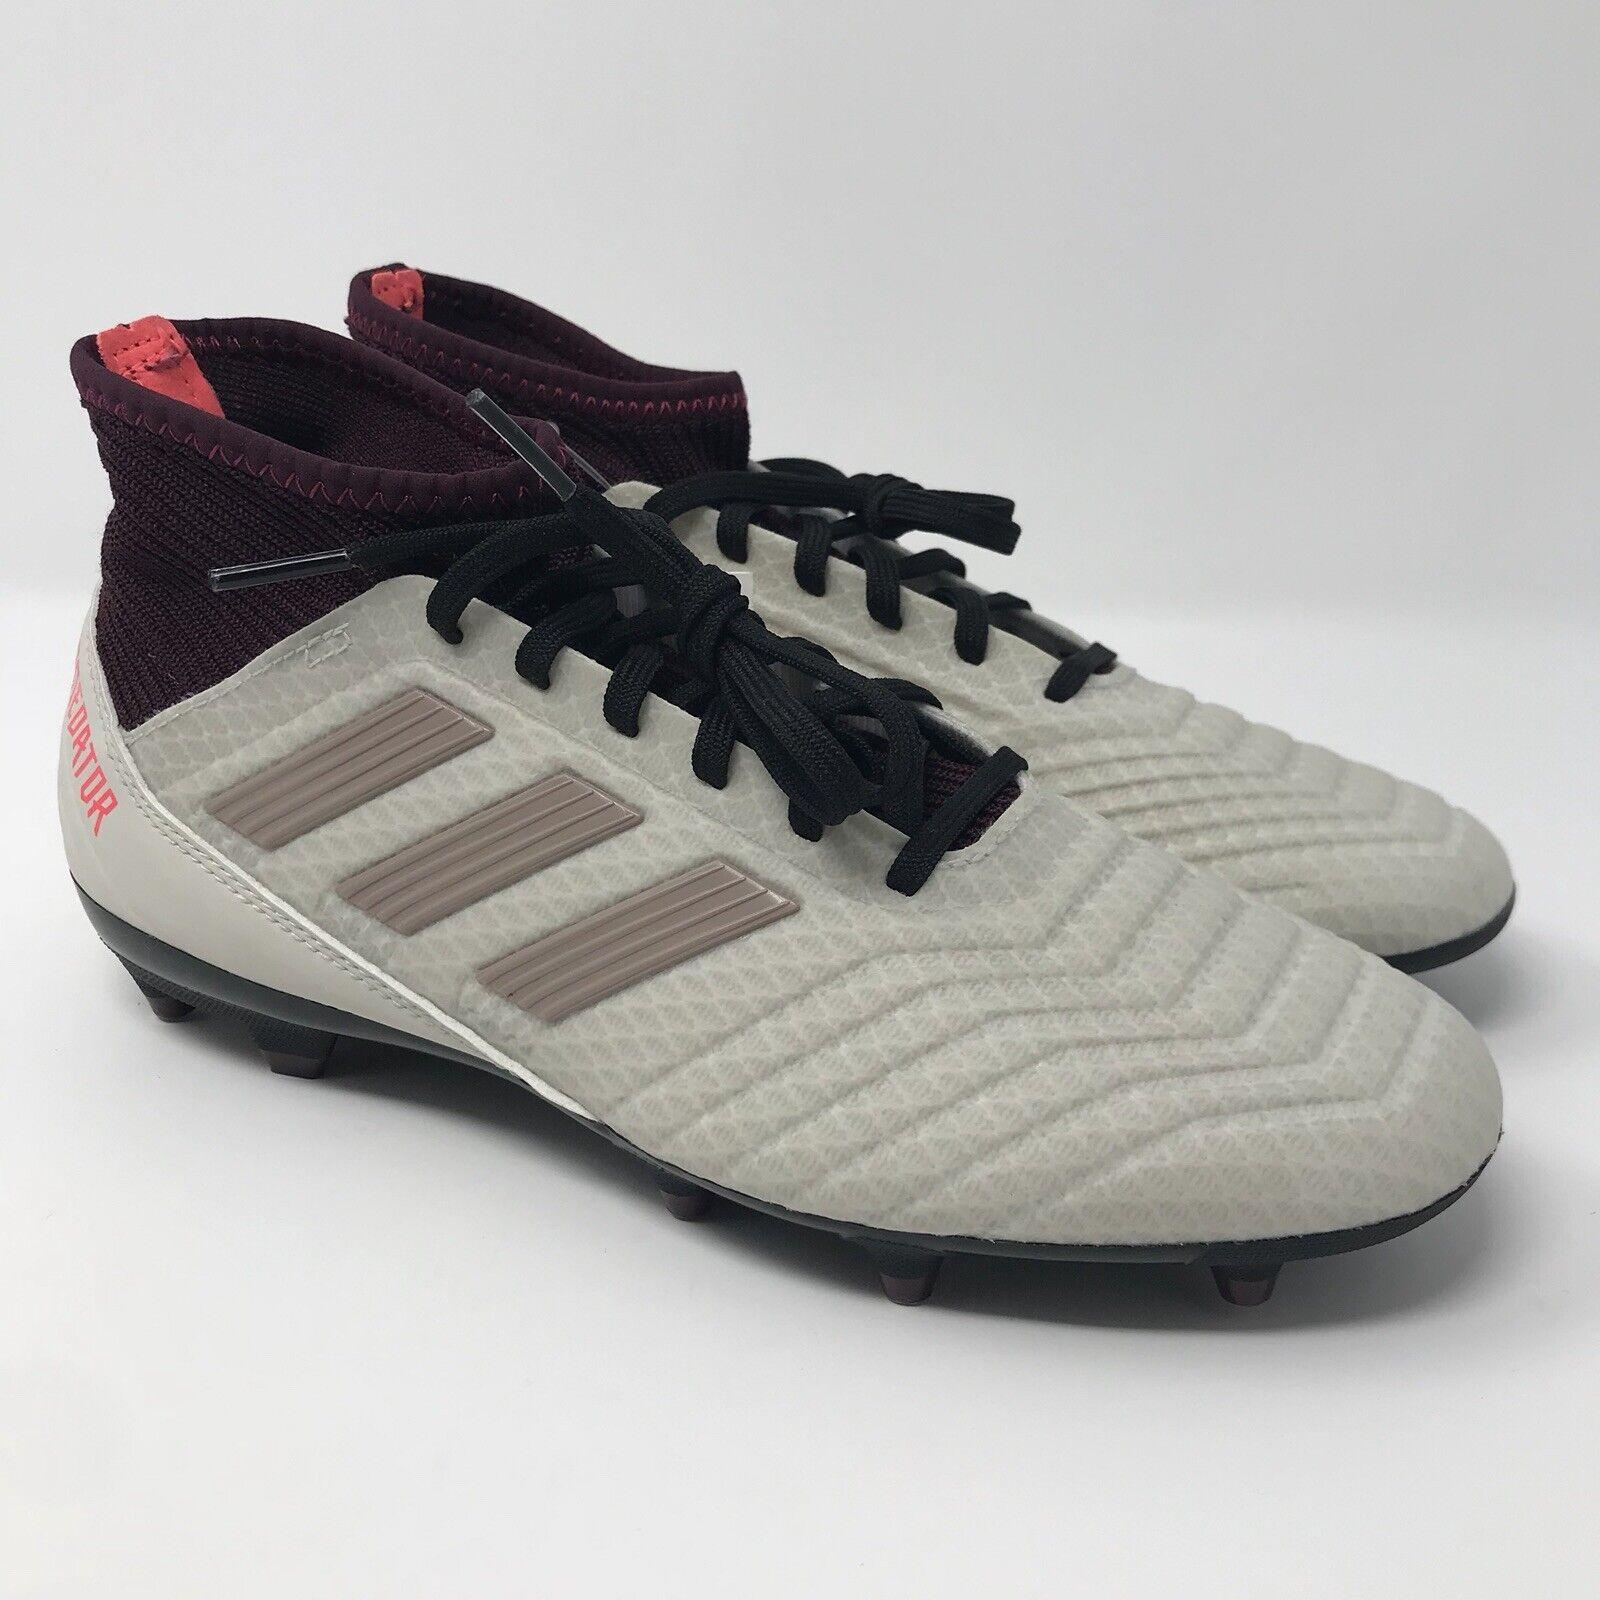 832a8fd0f Adidas Predator 18.3 FG Soccer Cleats Maroon DB2511 Women s Size 6.5 NEW